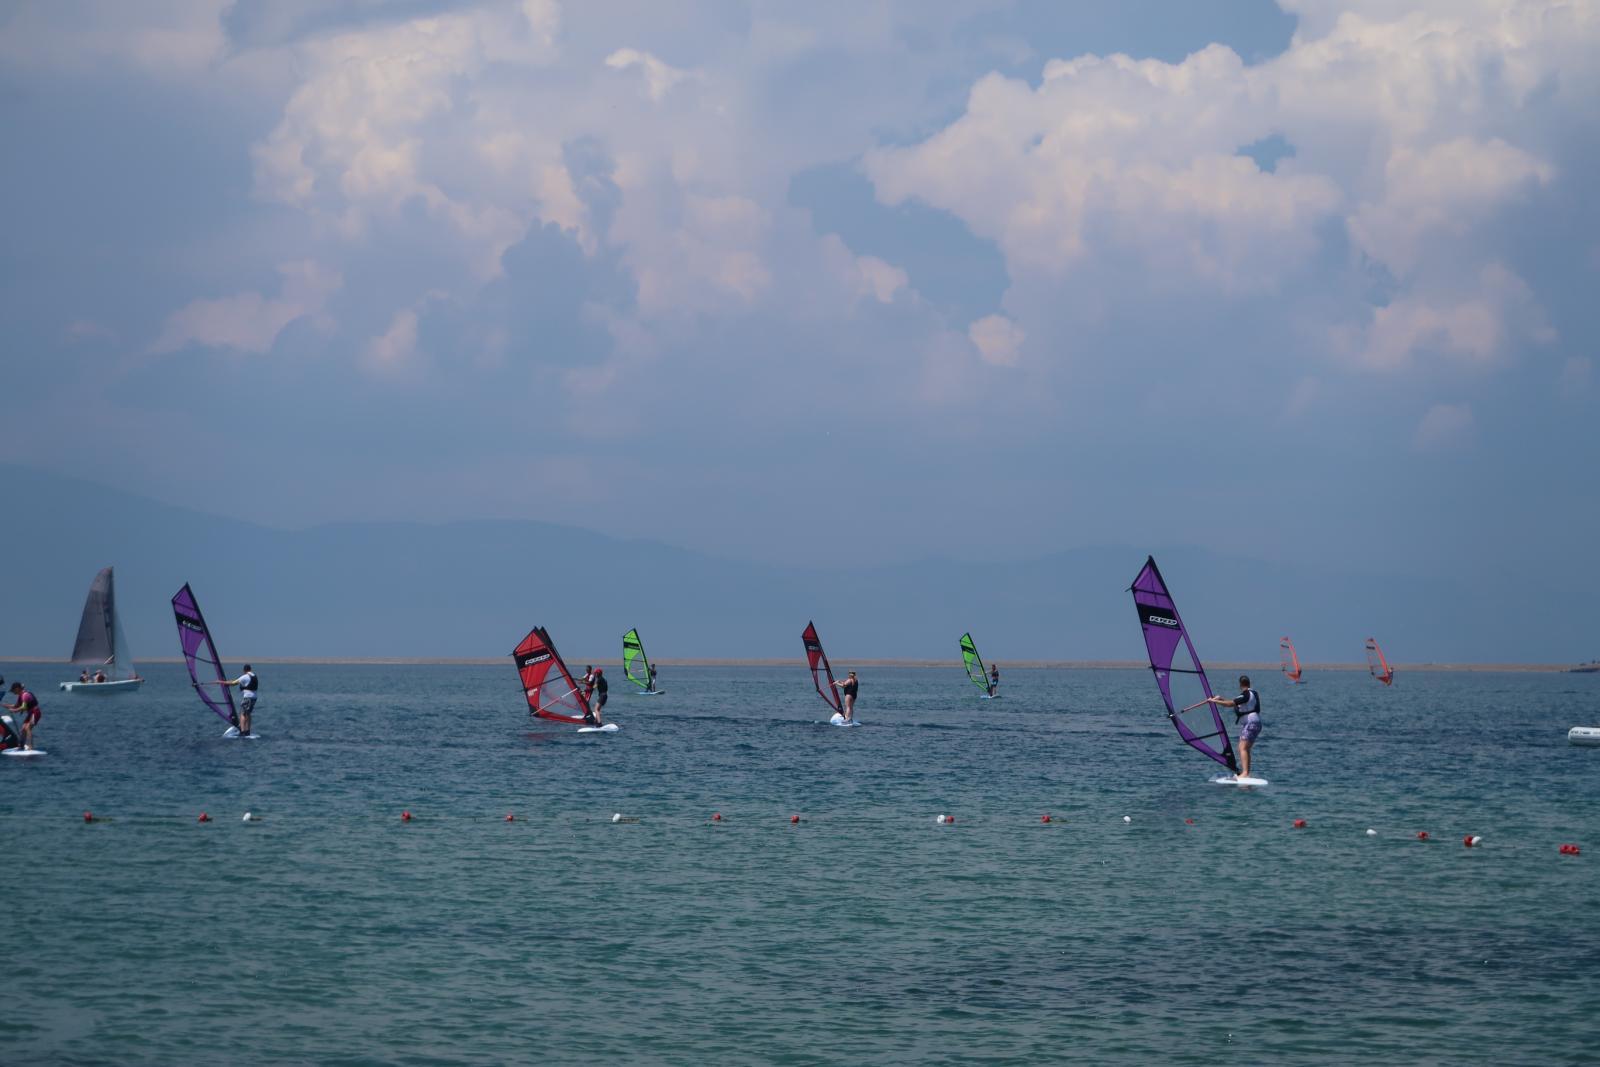 Mark Warner windsurfing